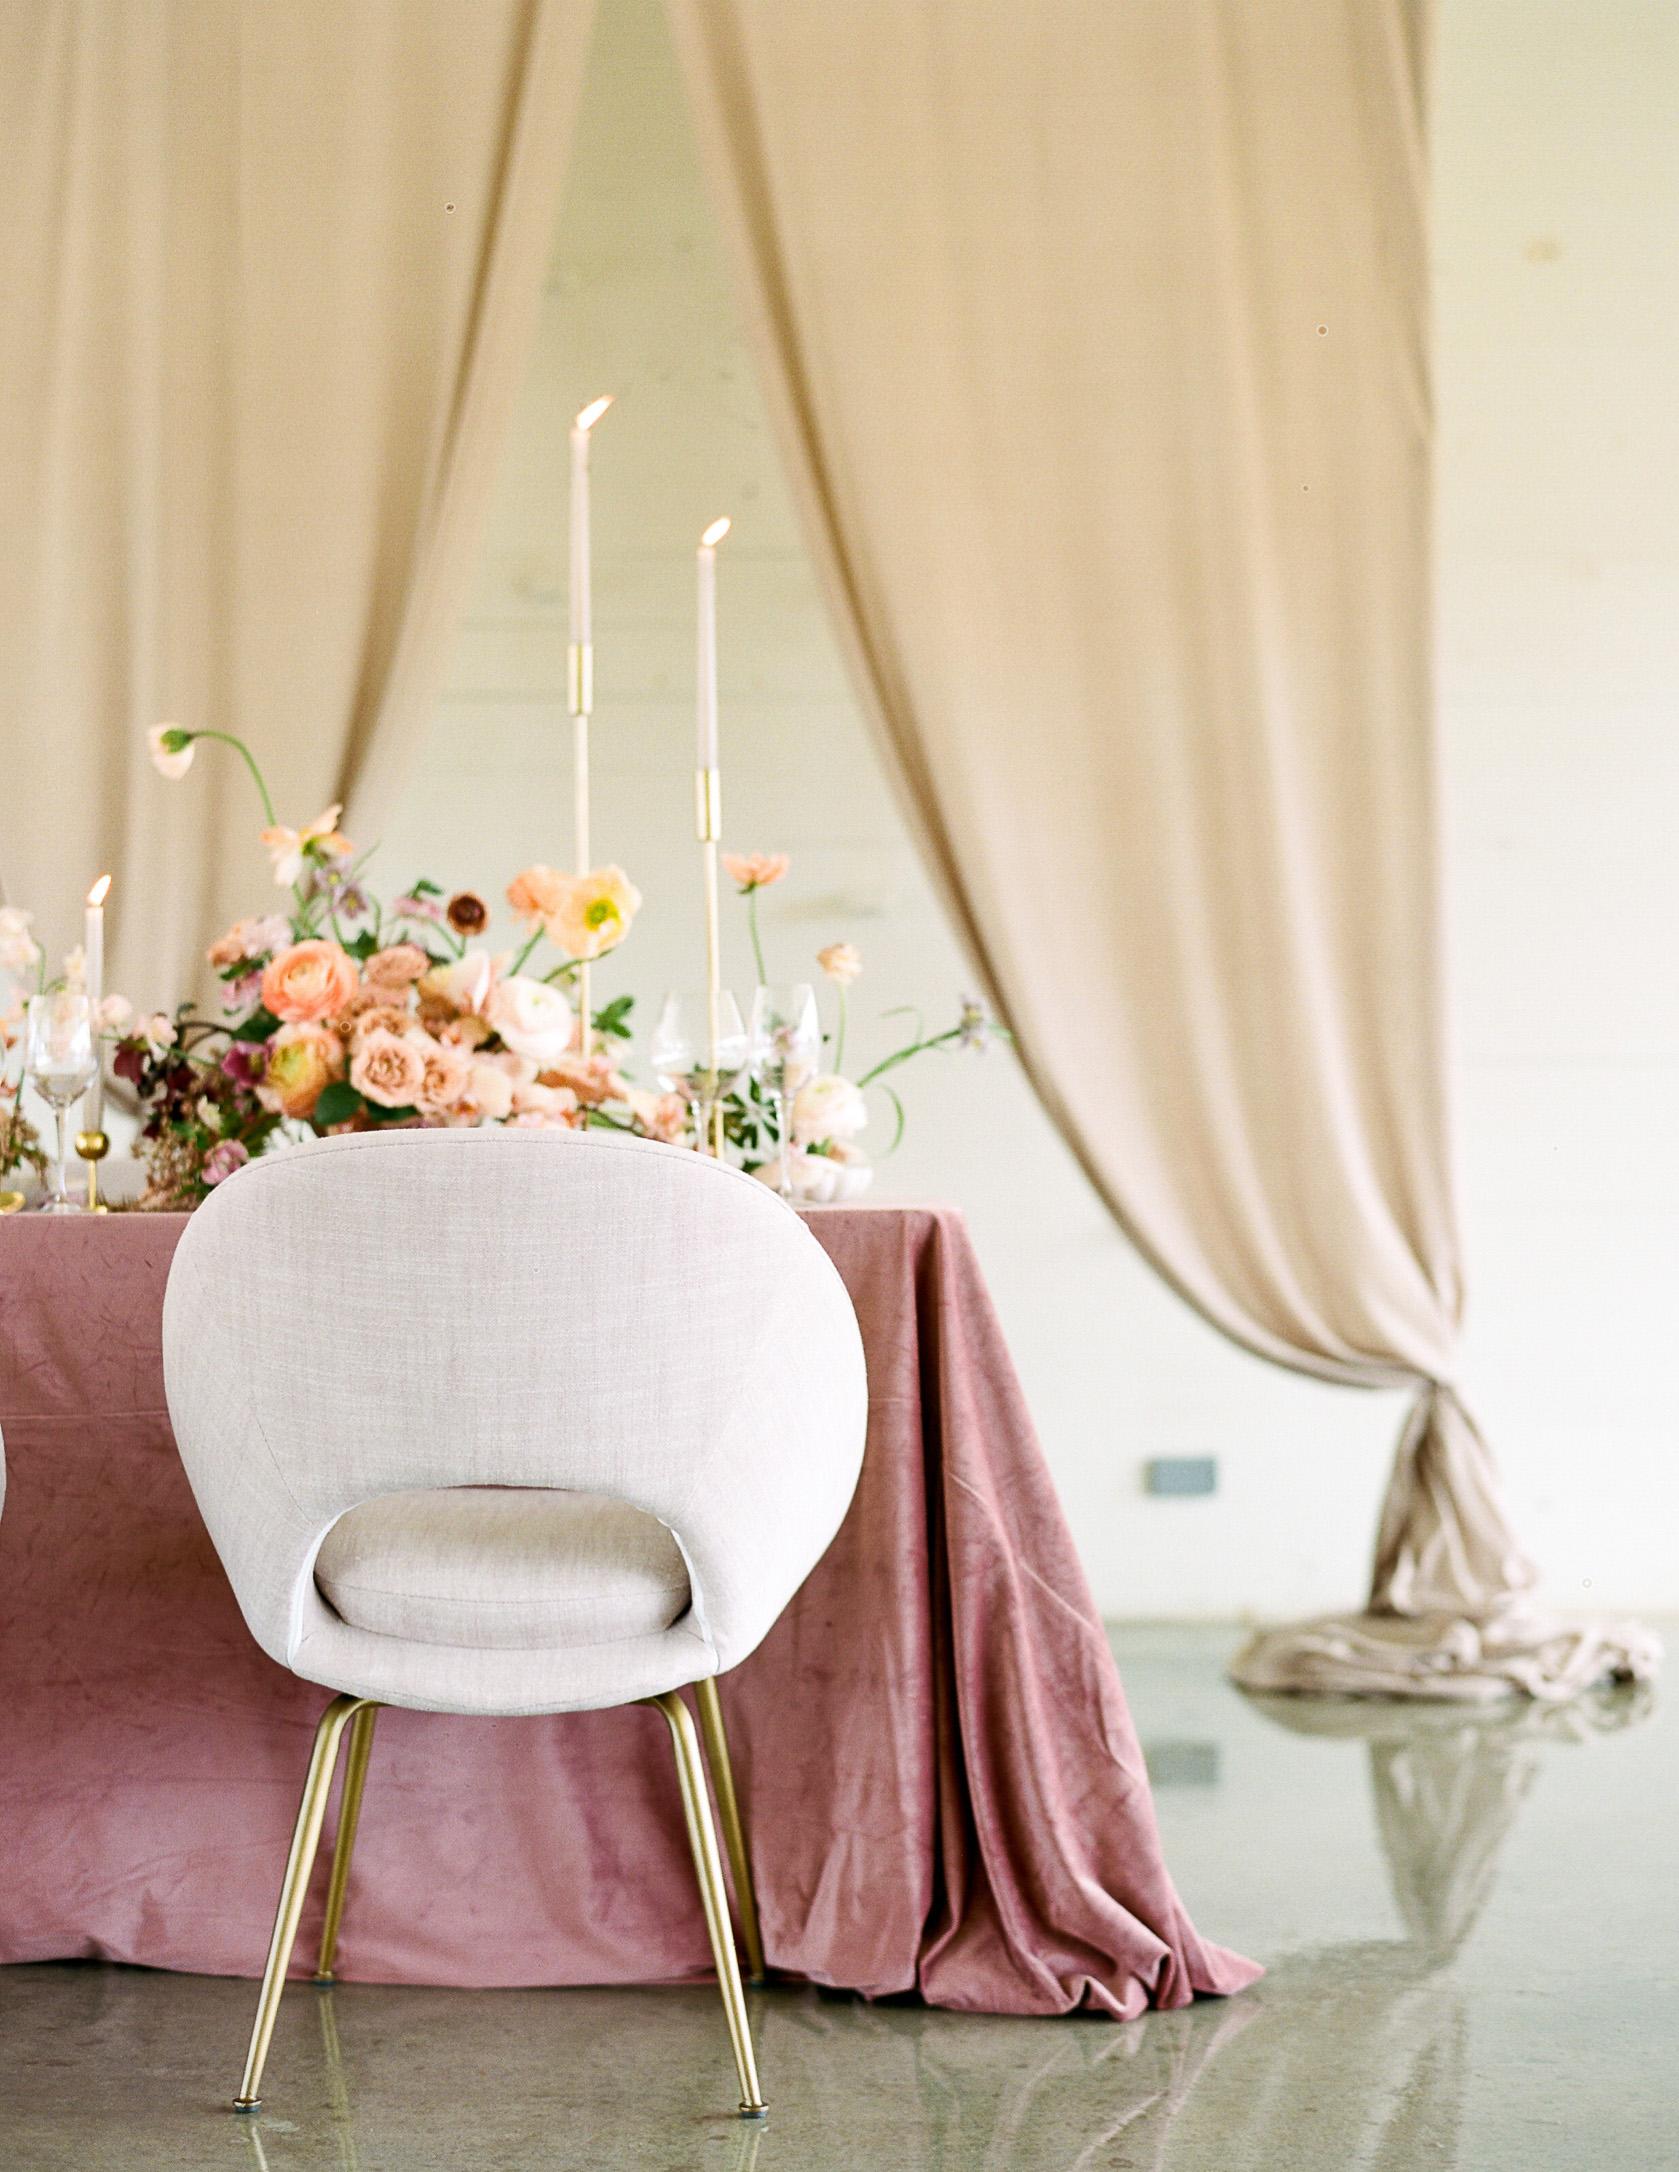 Austin-Wedding-Photography-Prospect-House-Fine-Art-Film-Destination-Dana-Josh-Fernandez-Photography-Dallas-Houston-Luxury-Best-Top-205.jpg